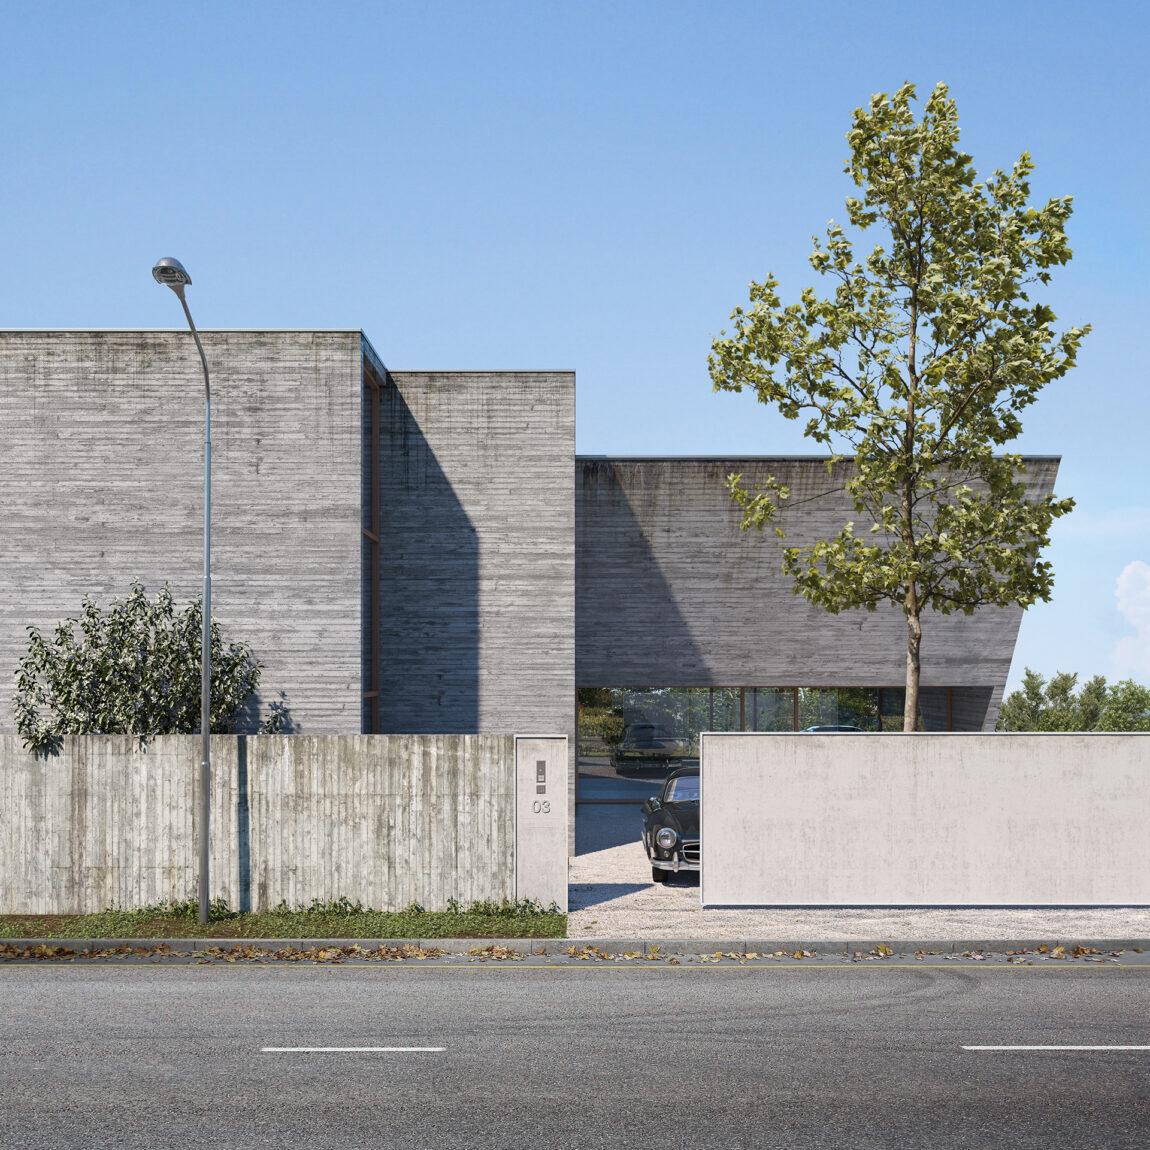 P1345 Maister Poortman beton HR 20200304